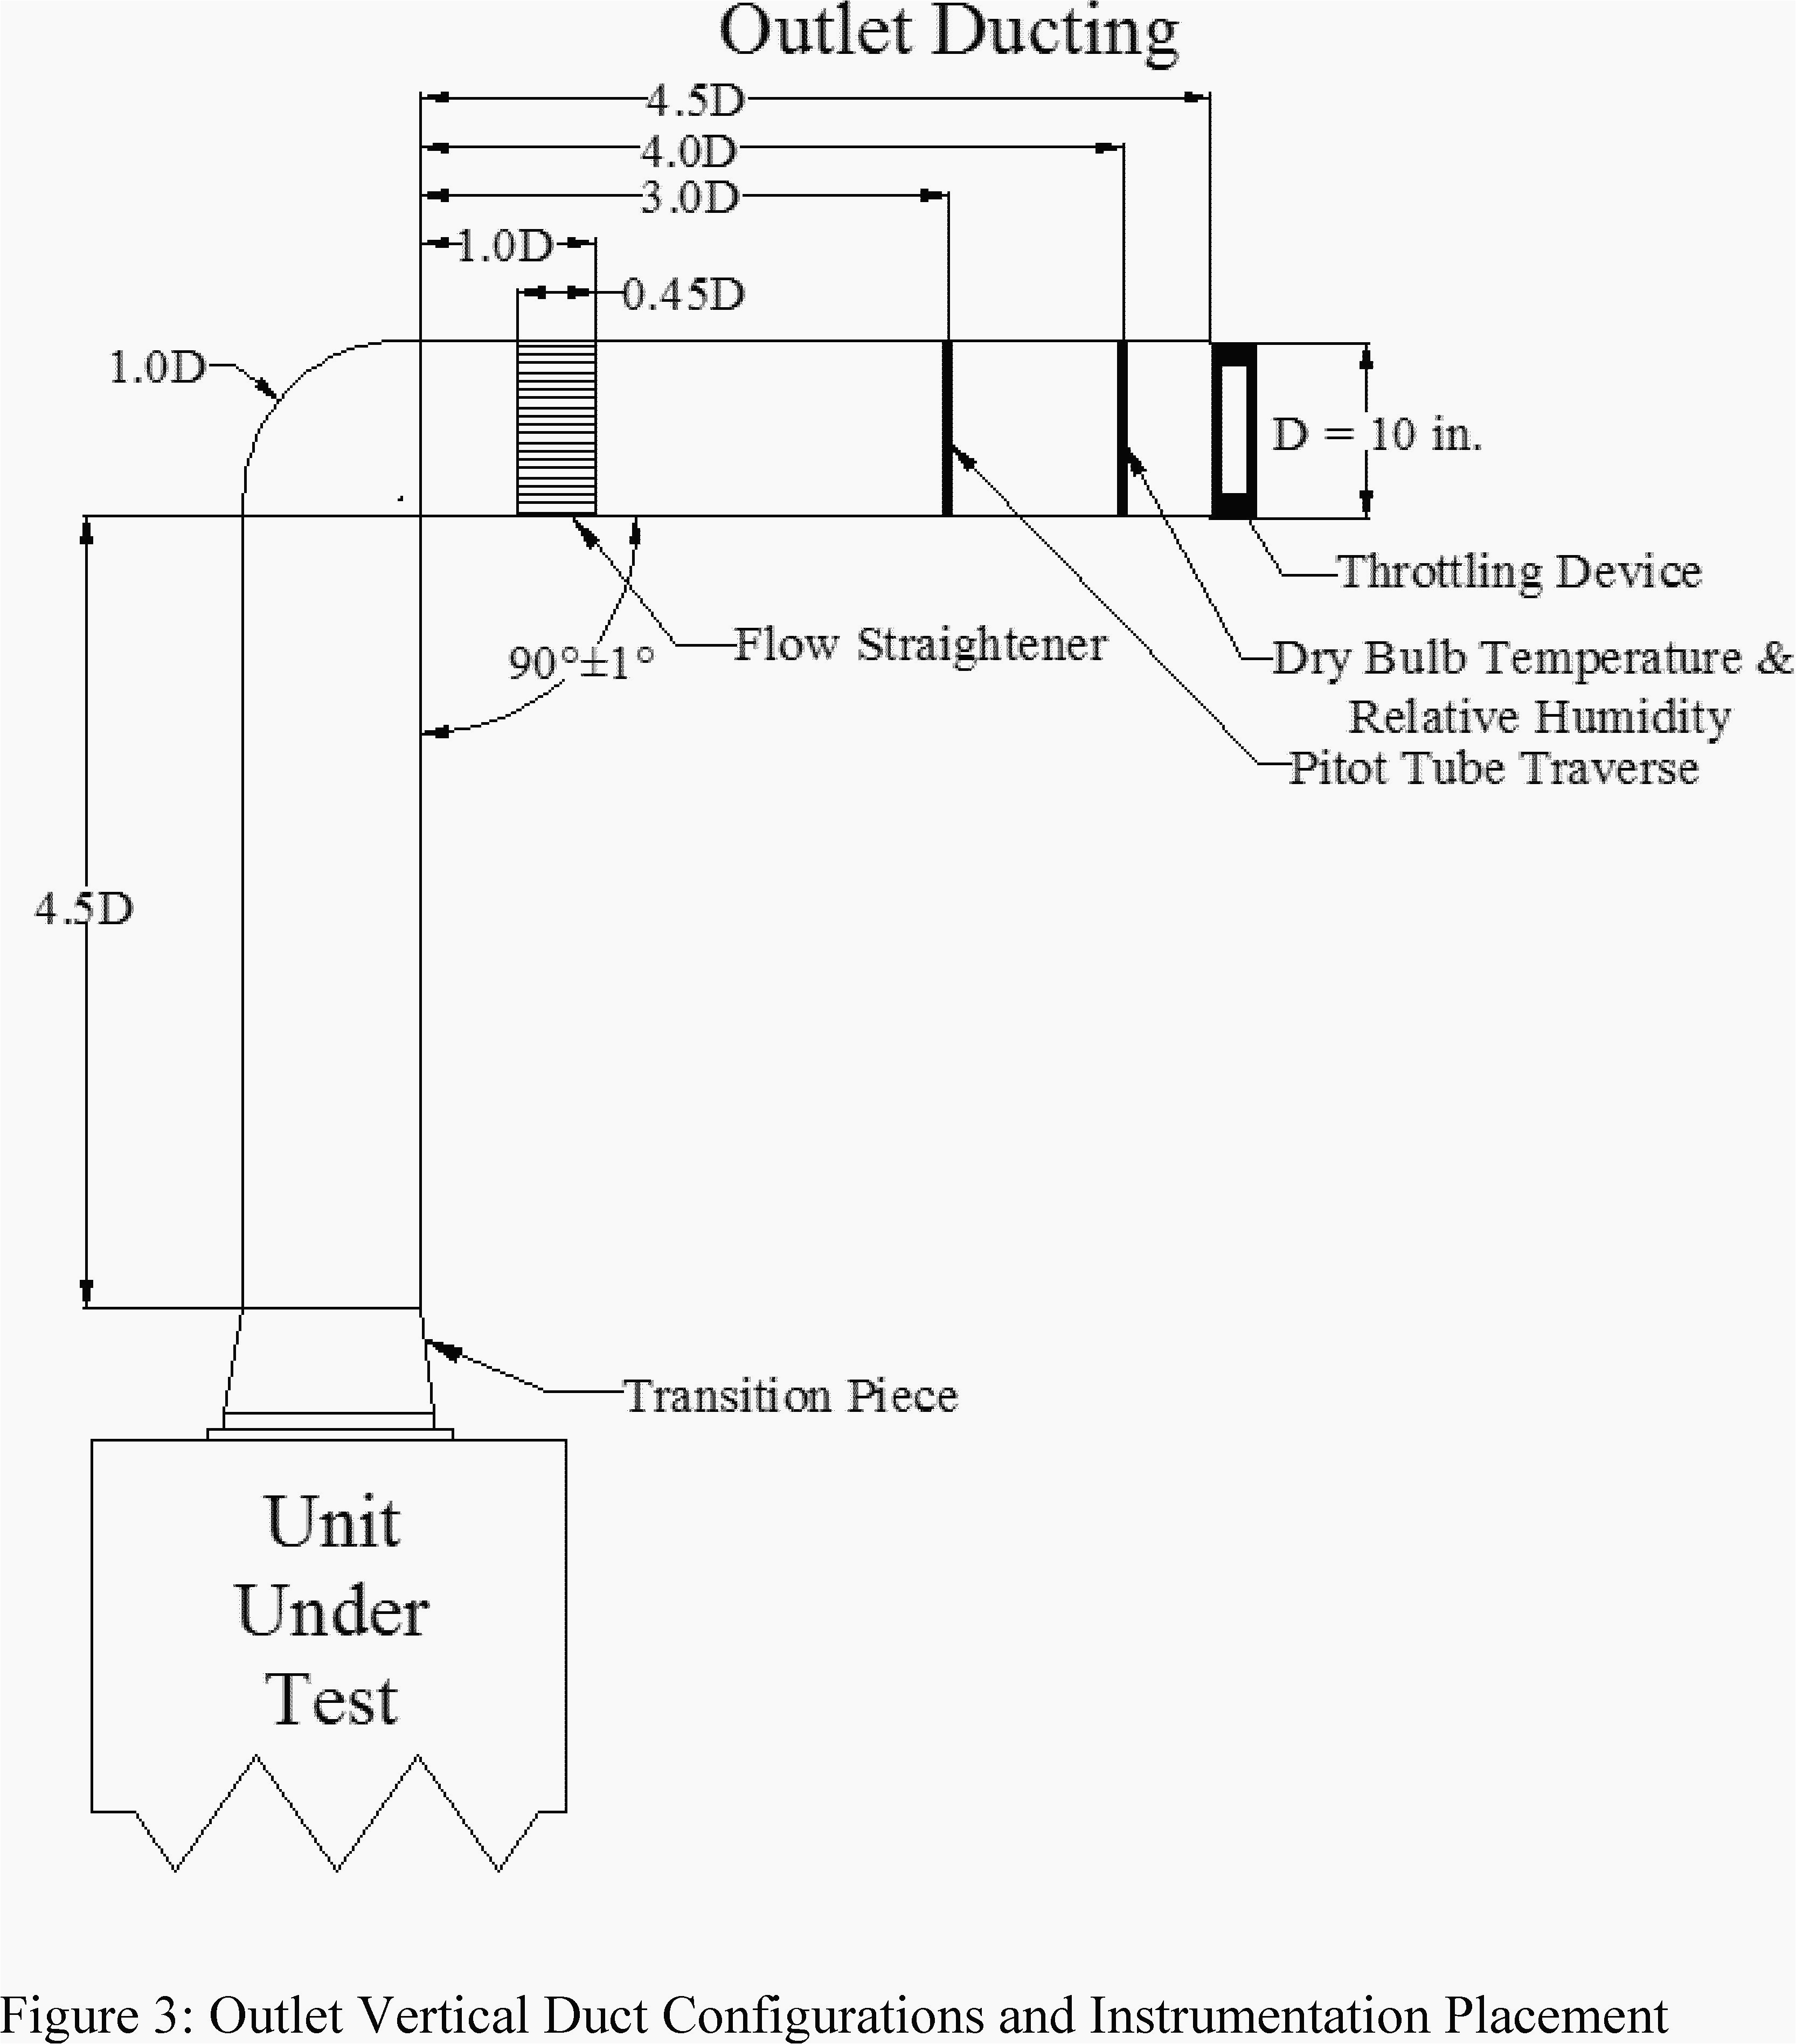 dewalt wiring diagram use wiring diagram dewalt wiring diagram wiring diagram de walt dw306 wiring diagram